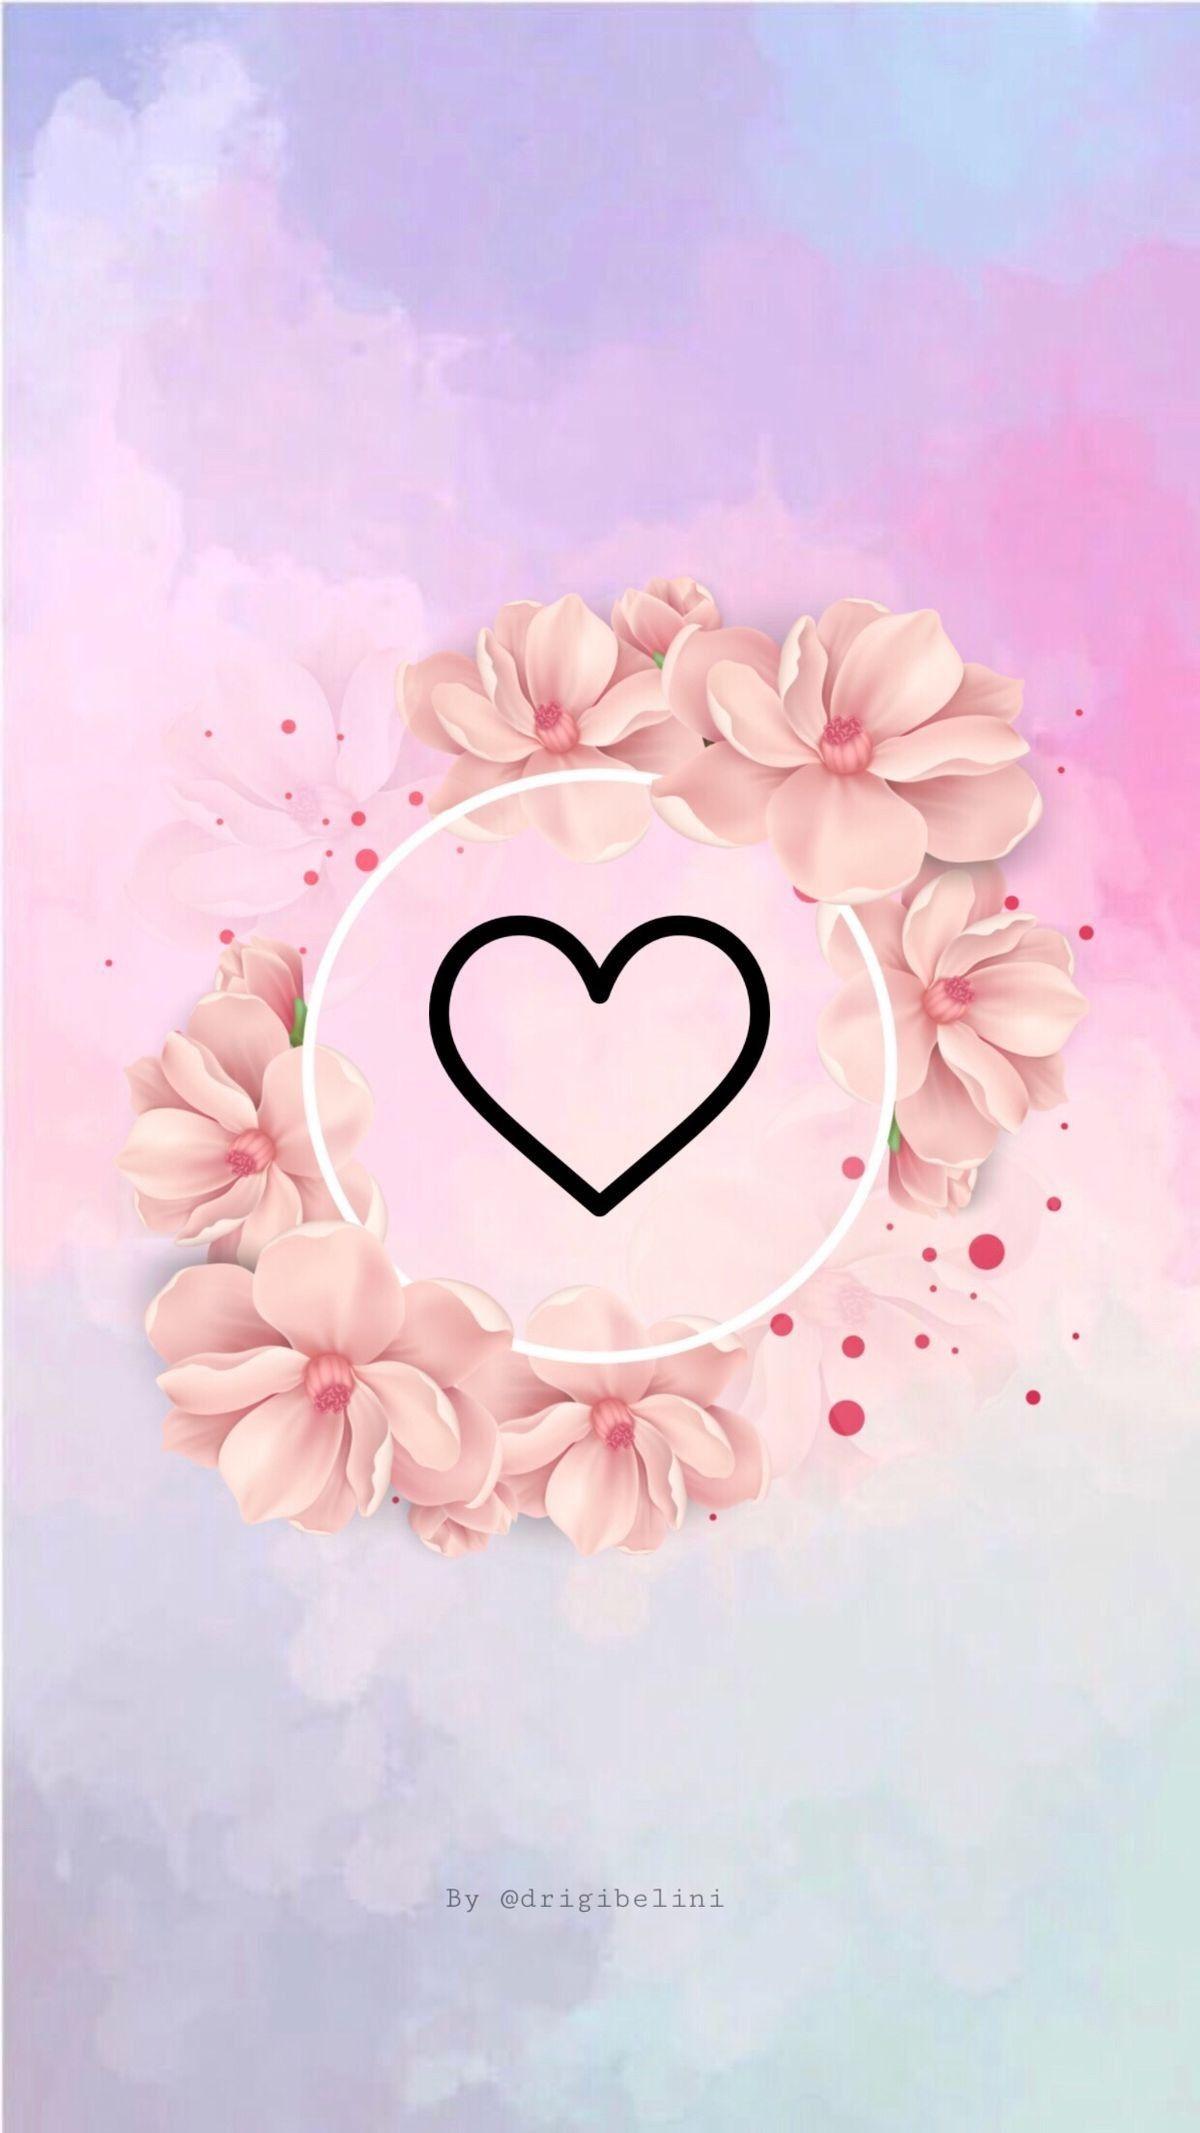 pinky heart ❤️ | Fondos de pantalla bonitos, Fondos de pantalla lindos para  iphone, Fondos de pantalla de iphone